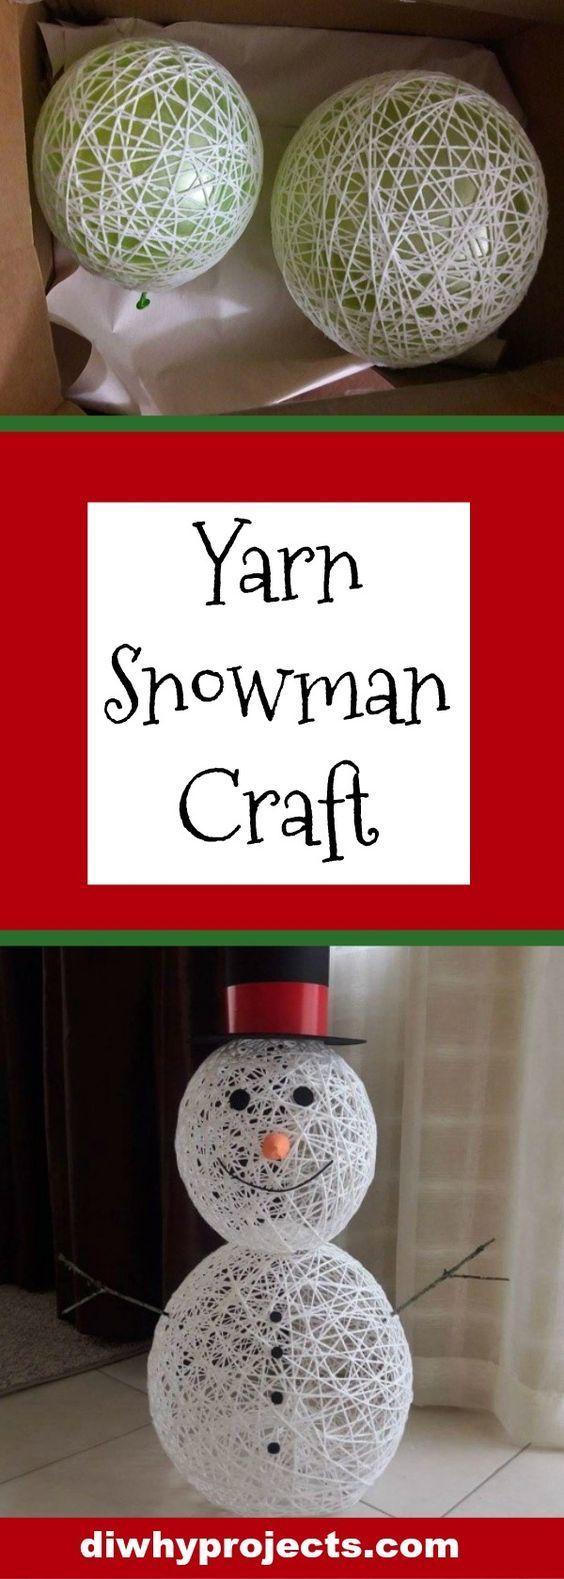 DIY Yarn Snowman Craft Tutorial, Snowman craft kids, Winter craft, Christmas craft #snowman